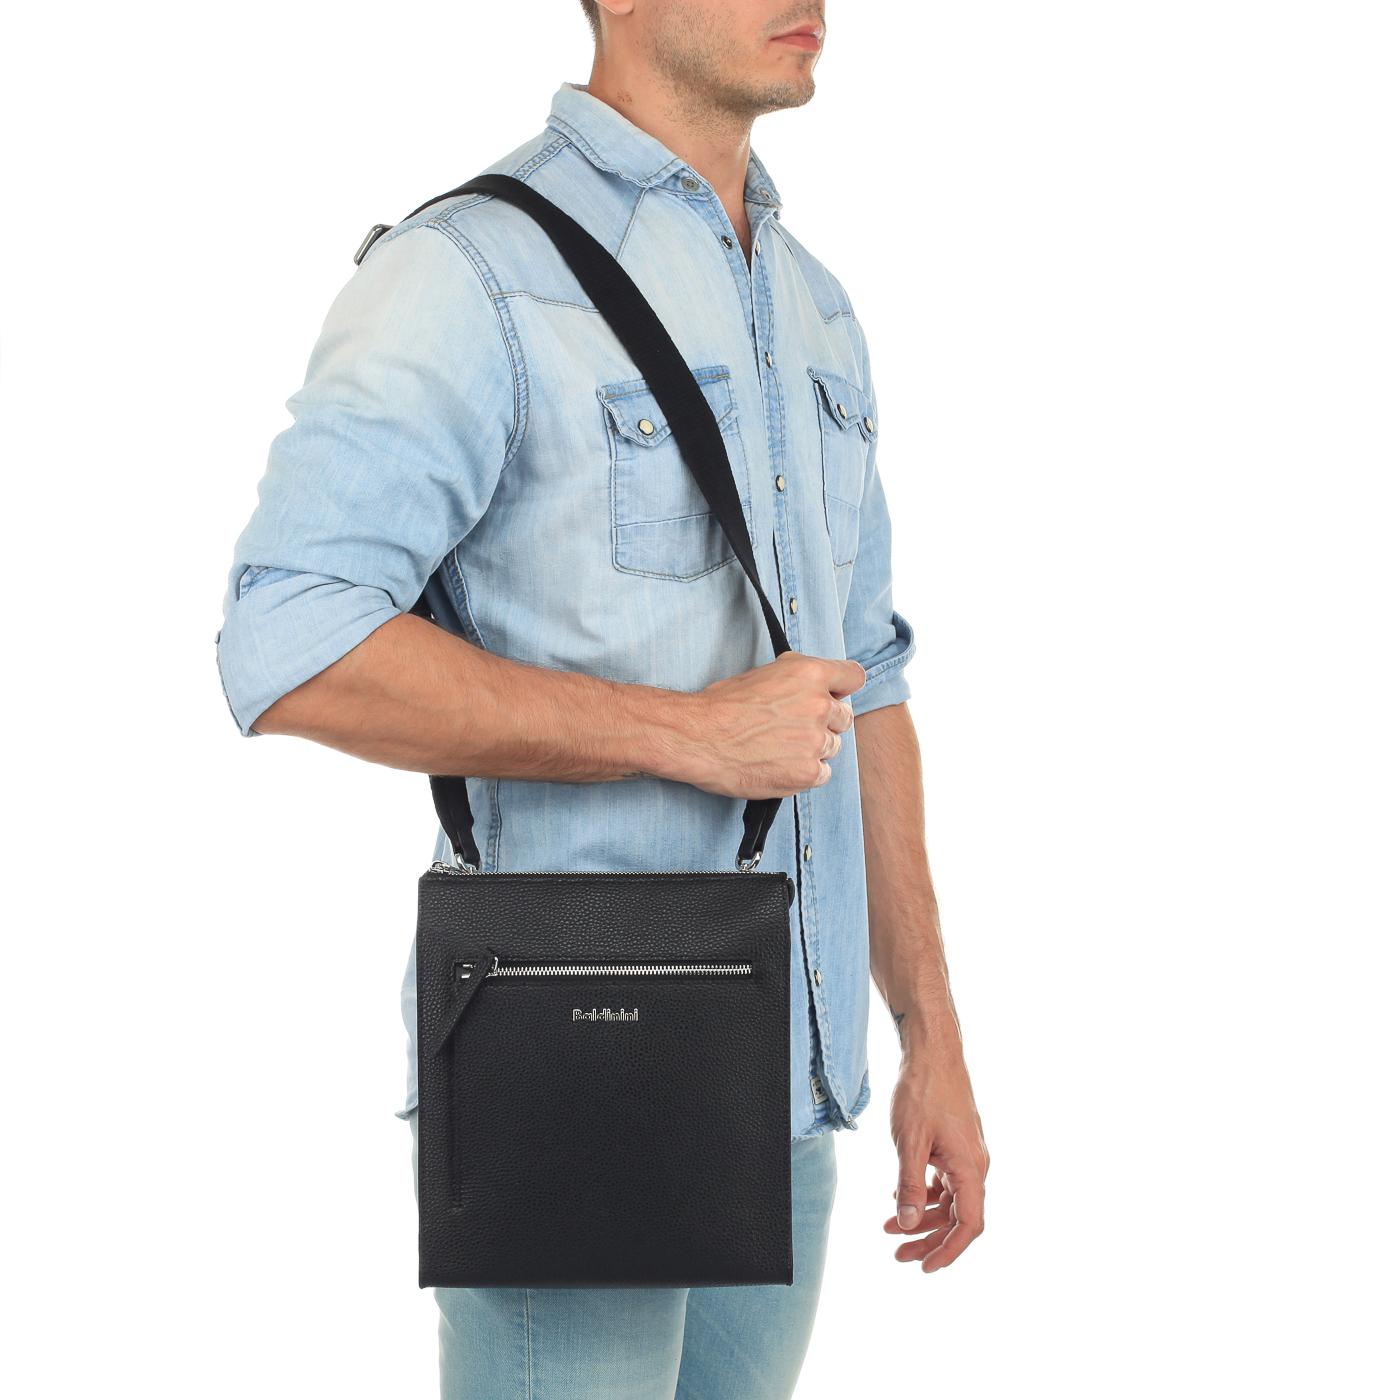 38820326a Мужская сумка-планшет Baldinini Brian G81PMG100022_black ...